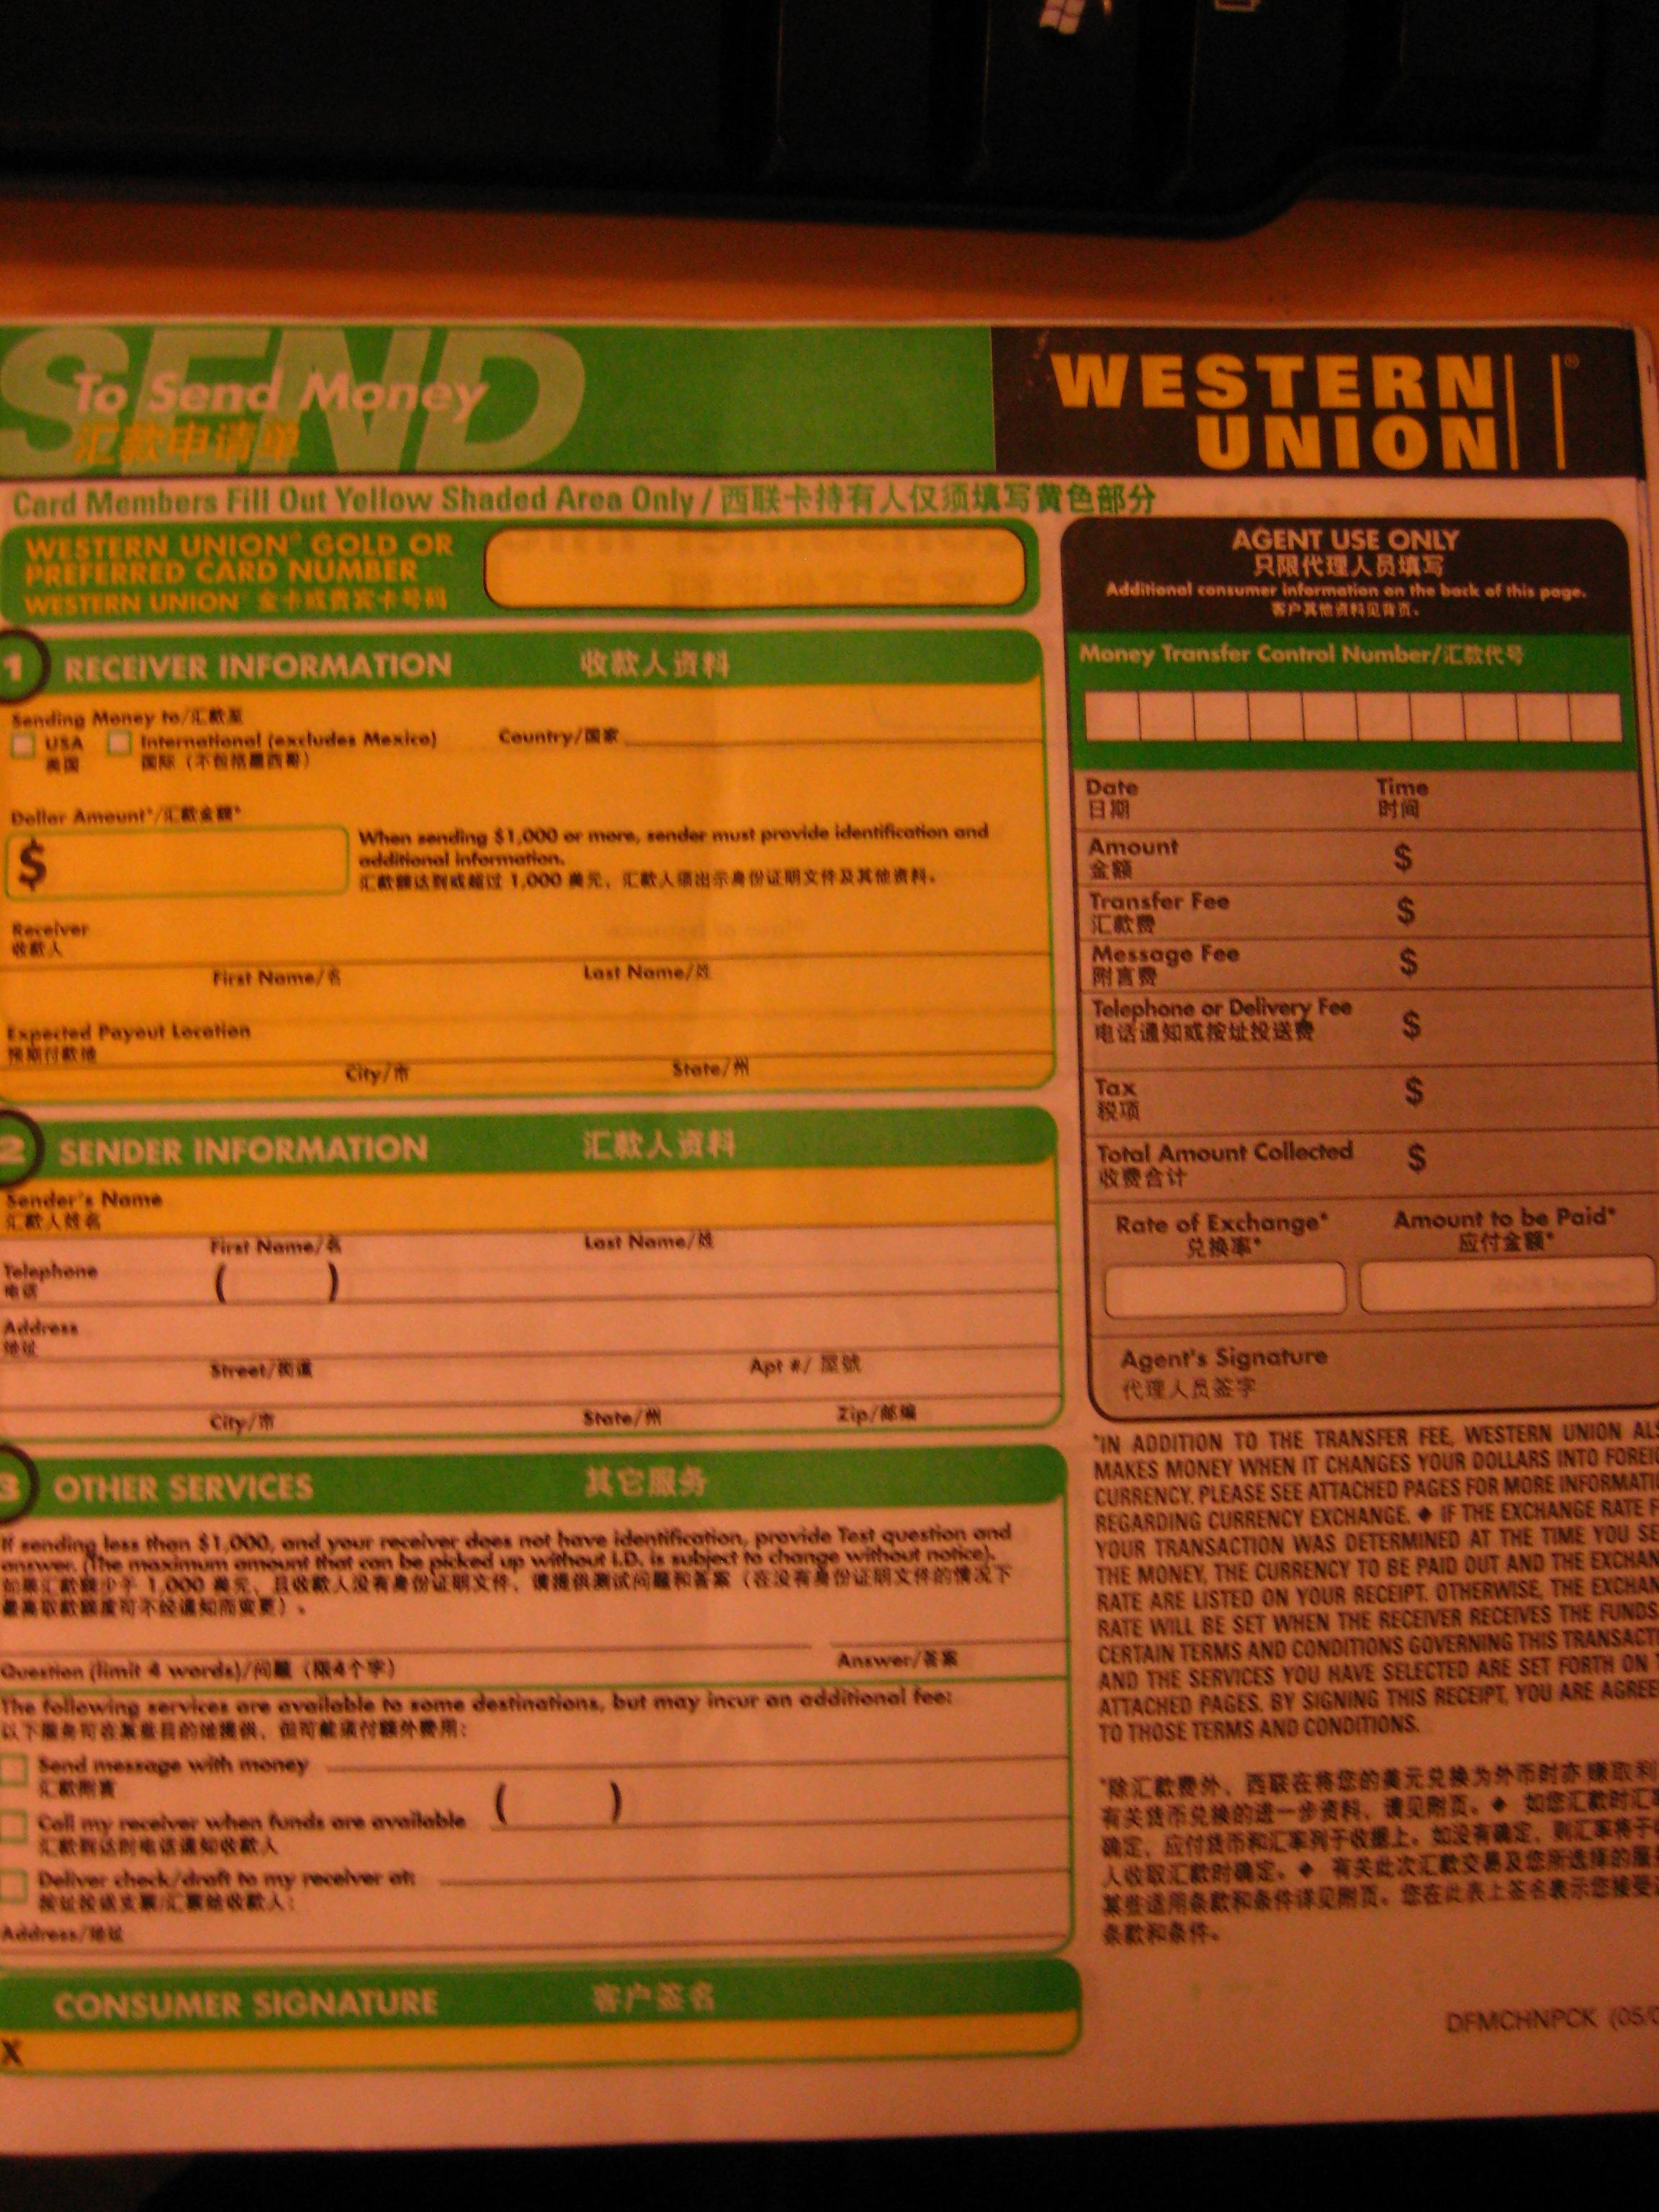 File:Western Union Send-Money jpg - East Broadway, Chinatown